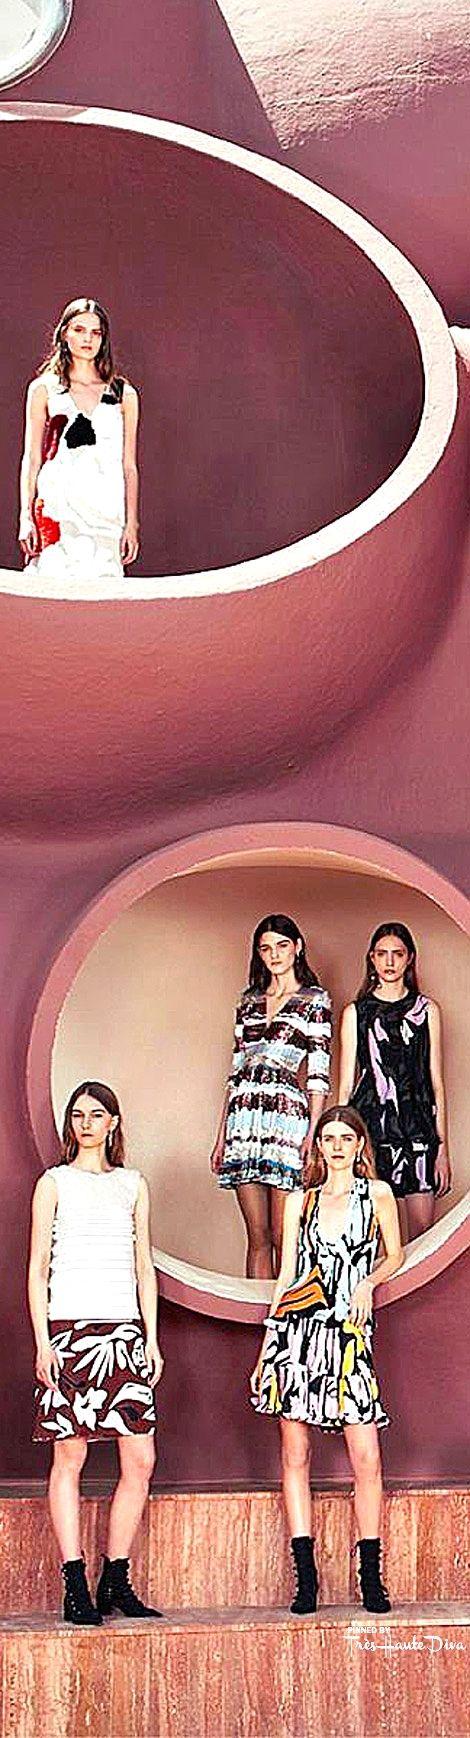 Christian Dior Resort 2016 Cannes ♔ Très Haute Diva ♔ Visit my new website www.treshautediva...